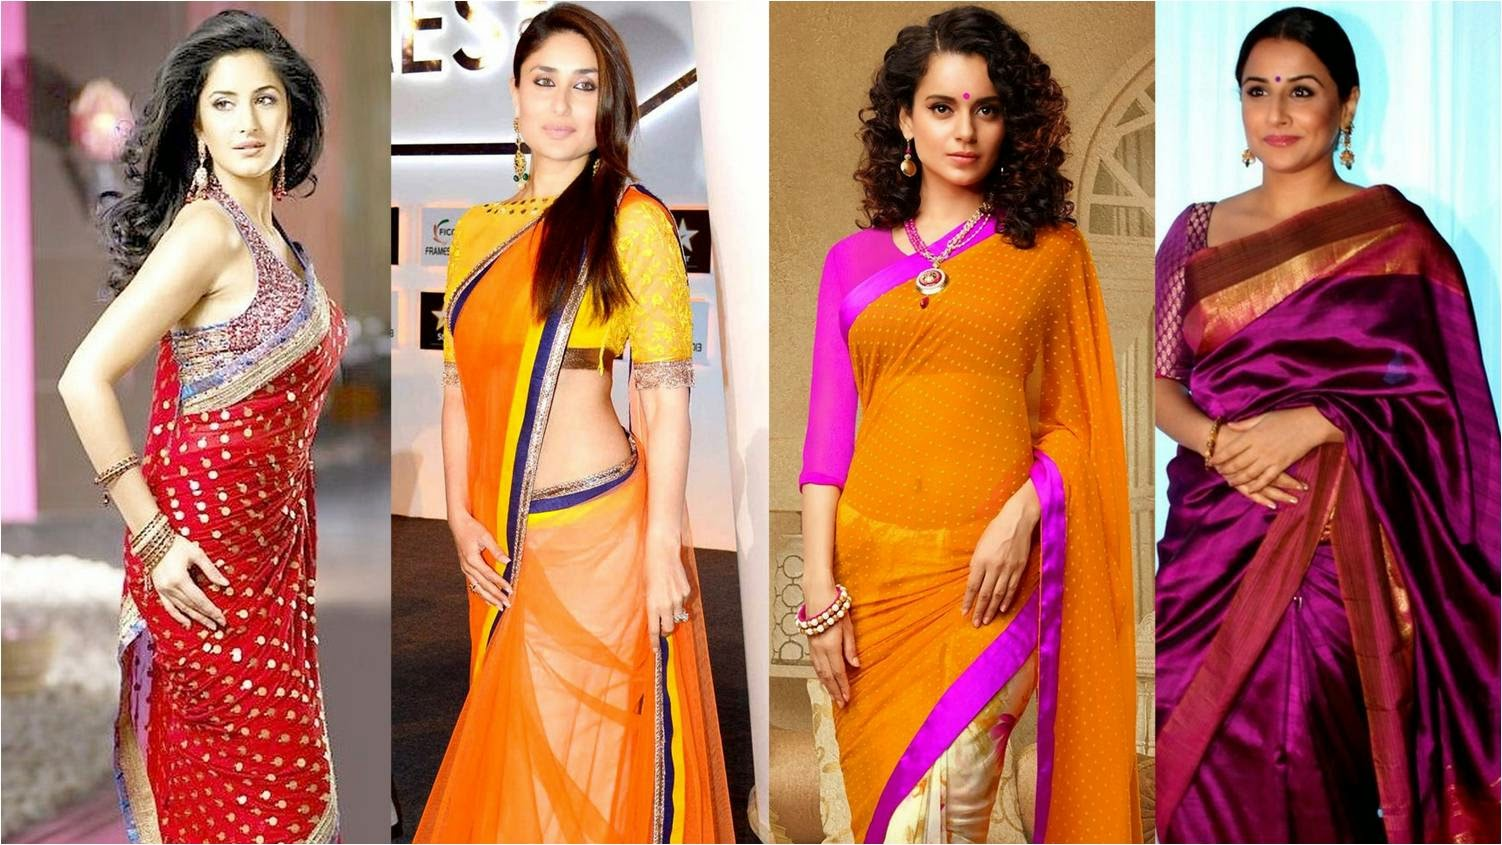 Casting of hero heroine for Durga Rani Singh directed by Sujoy Ghosh